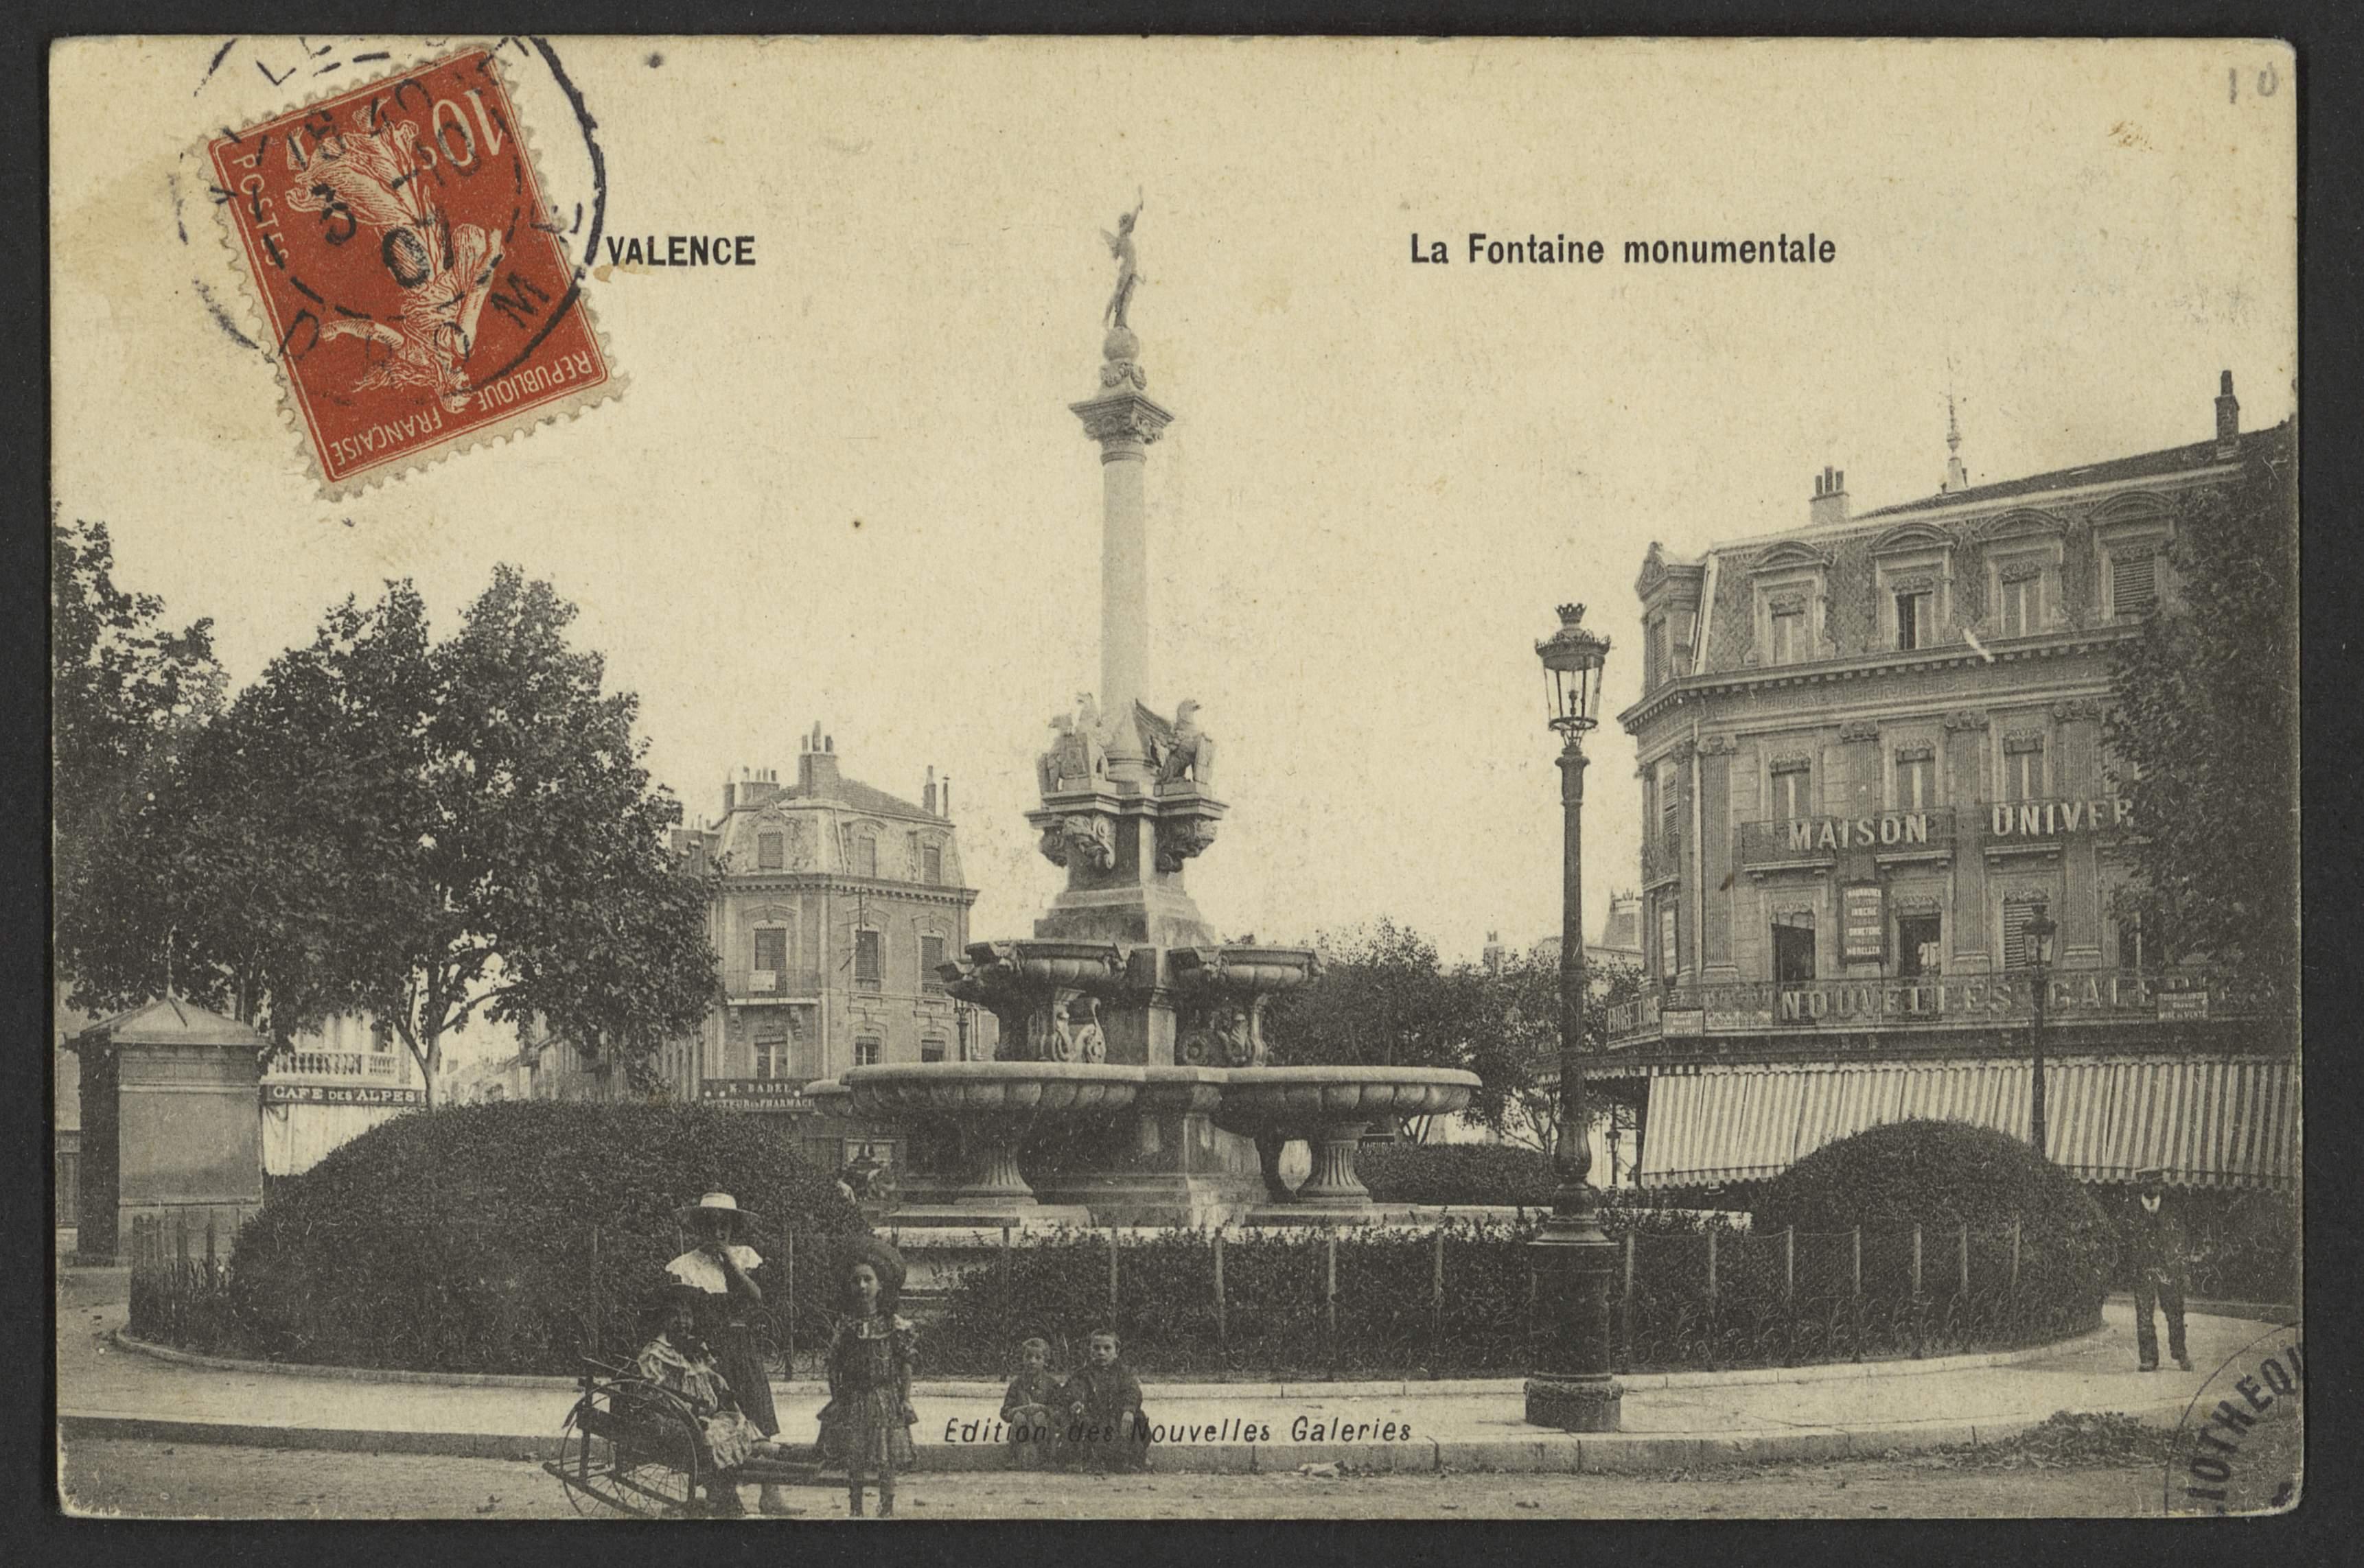 Valence - La Fontaine monumentale